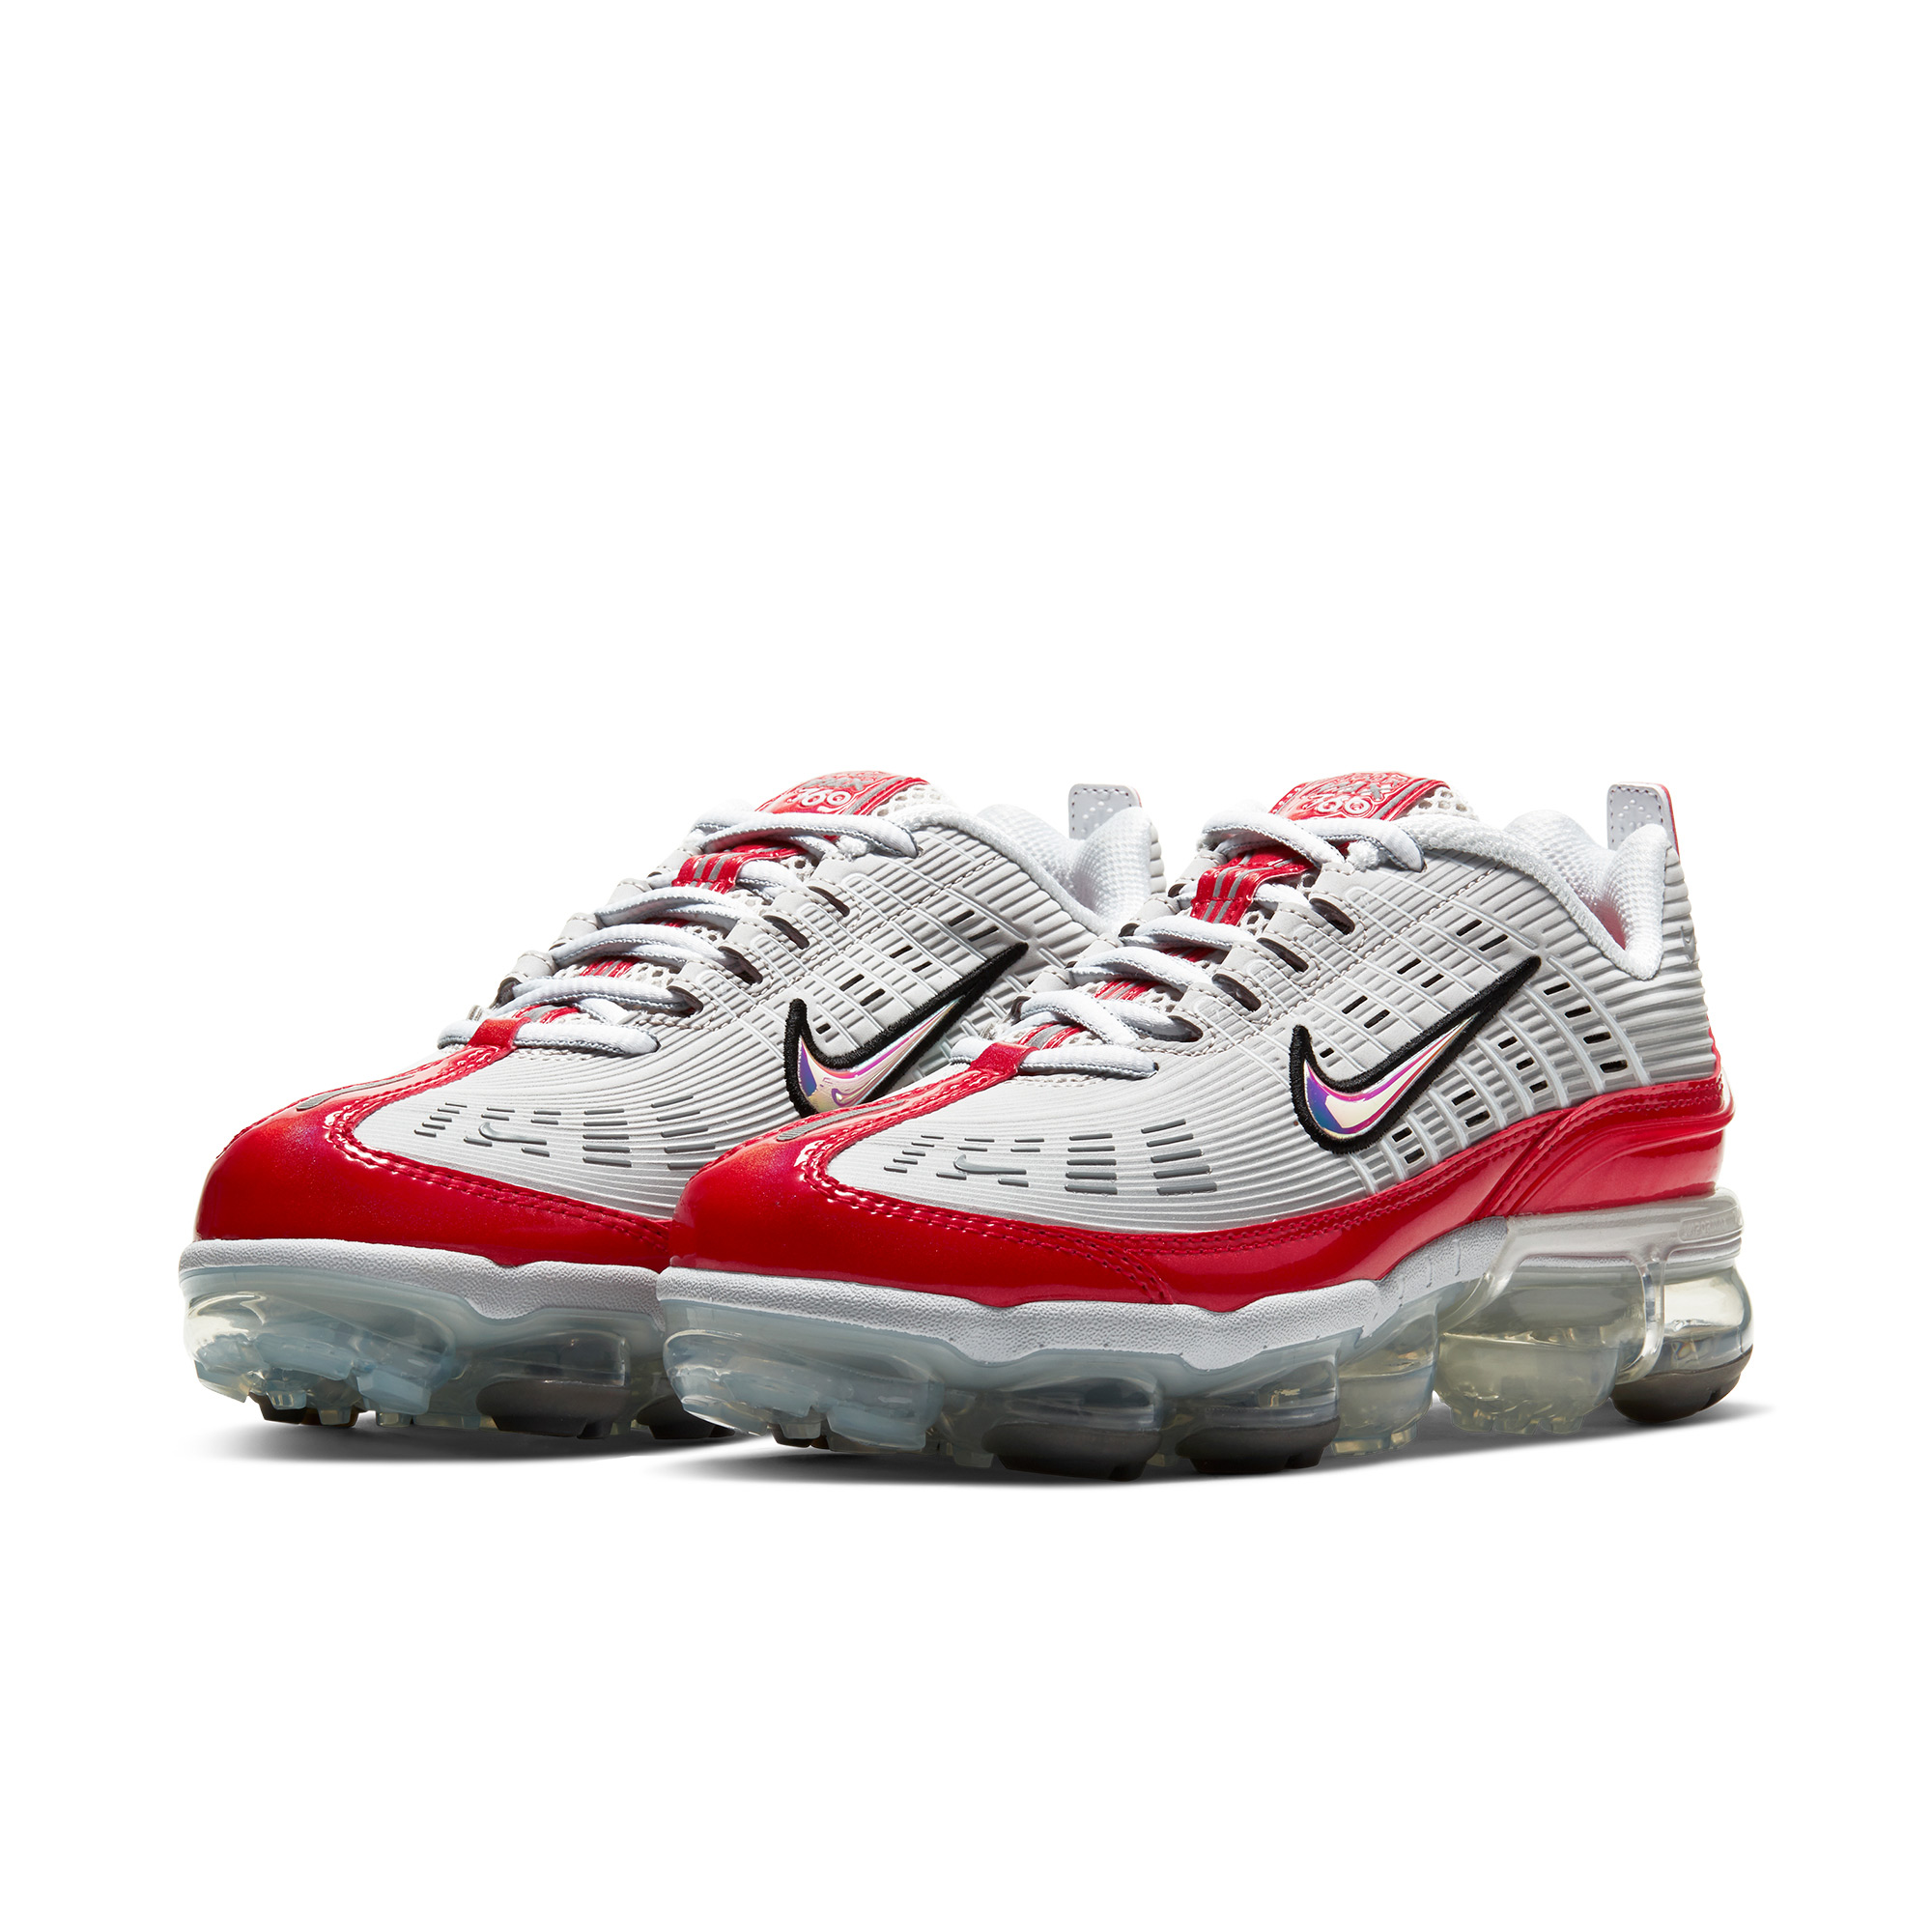 NIKE 耐克 Air VaporMax 360 女士休闲运动鞋 CK2719-001 白银红 35.5